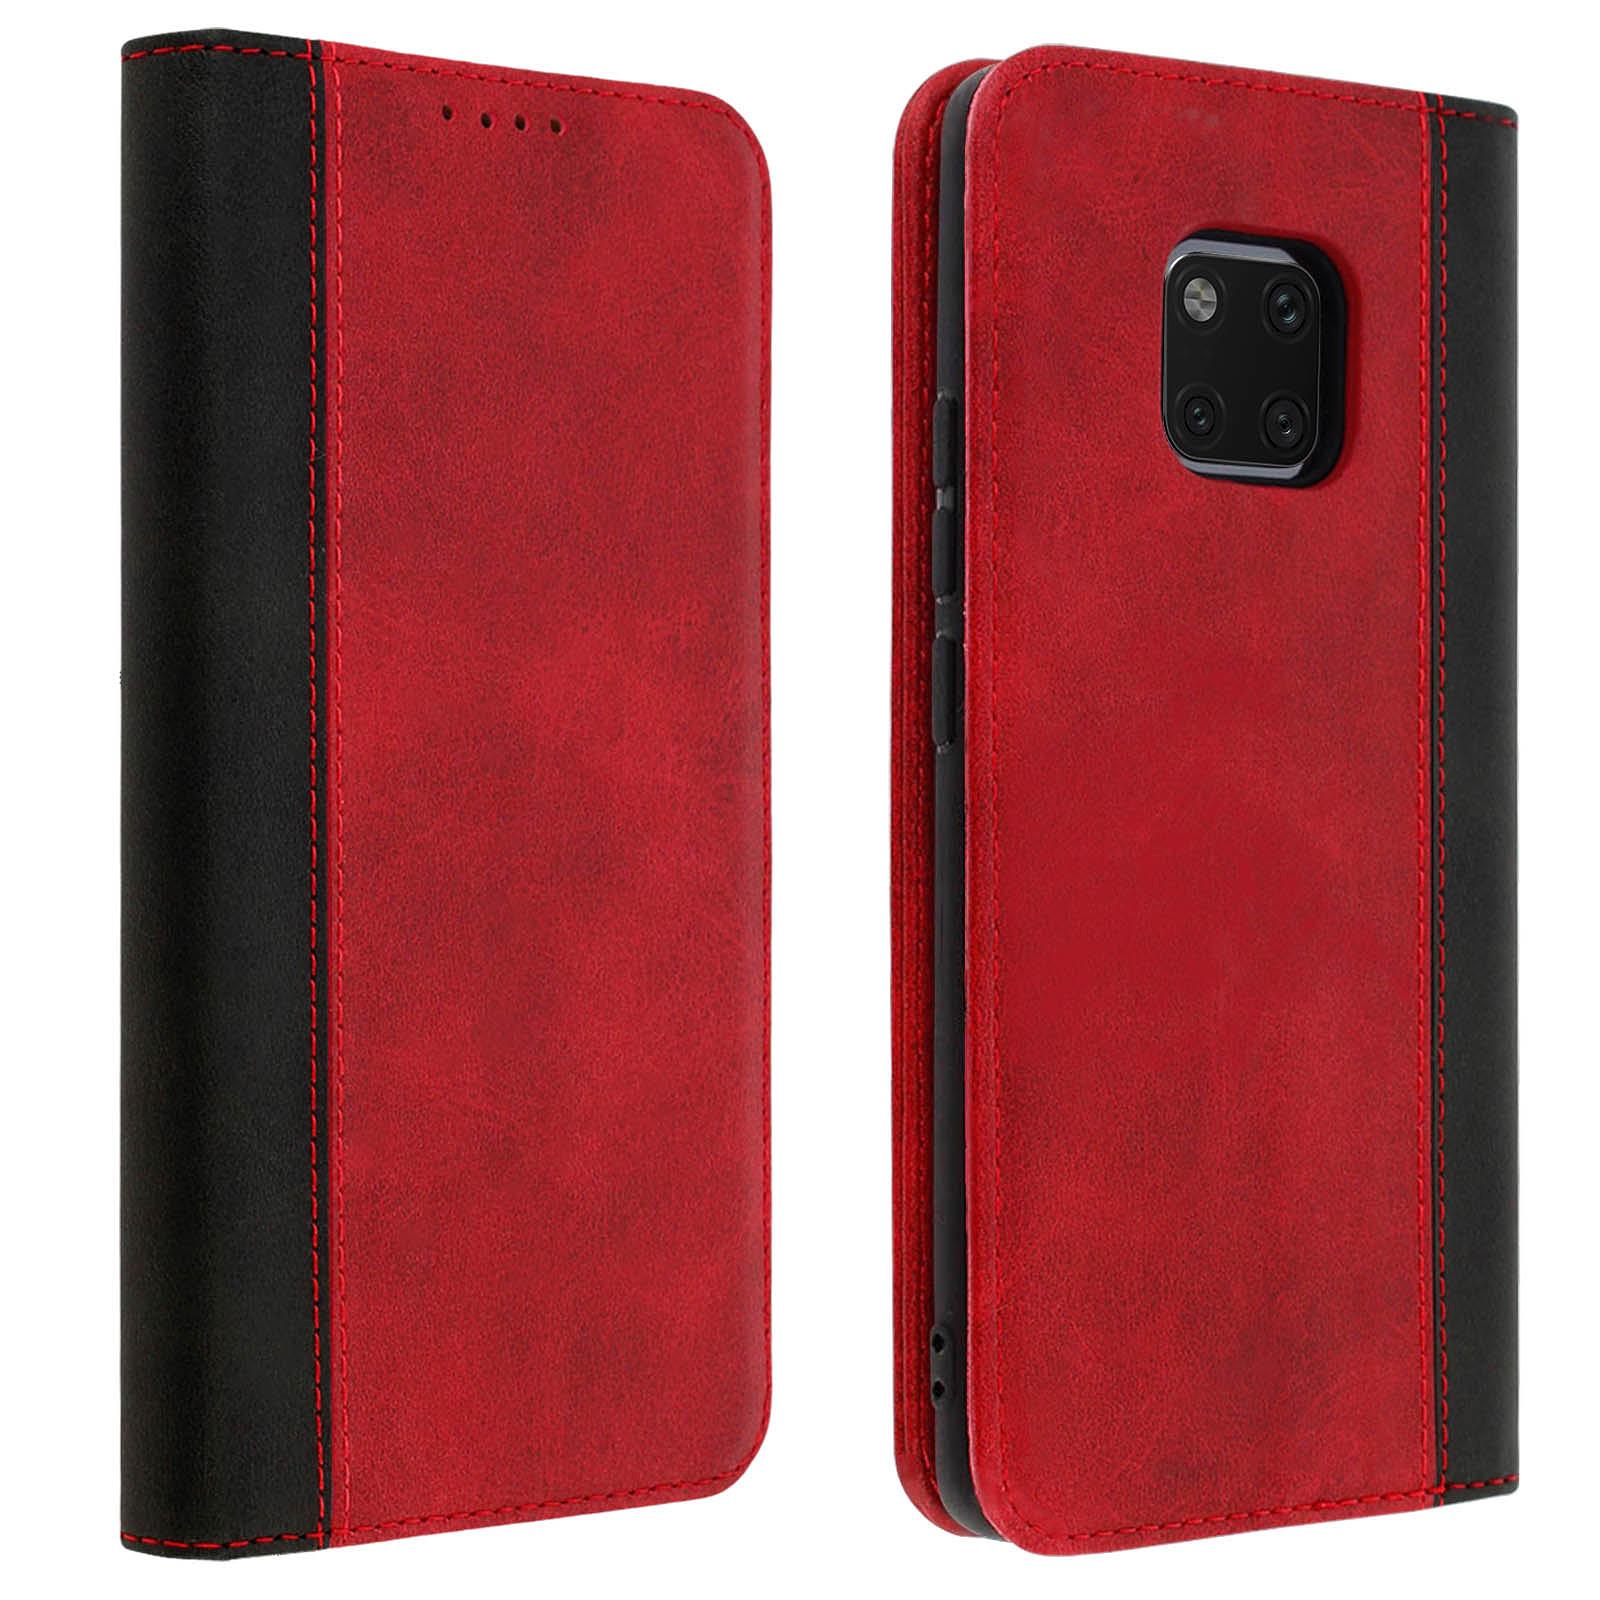 Avizar Etui folio Rouge Éco-cuir pour Huawei Mate 20 Pro